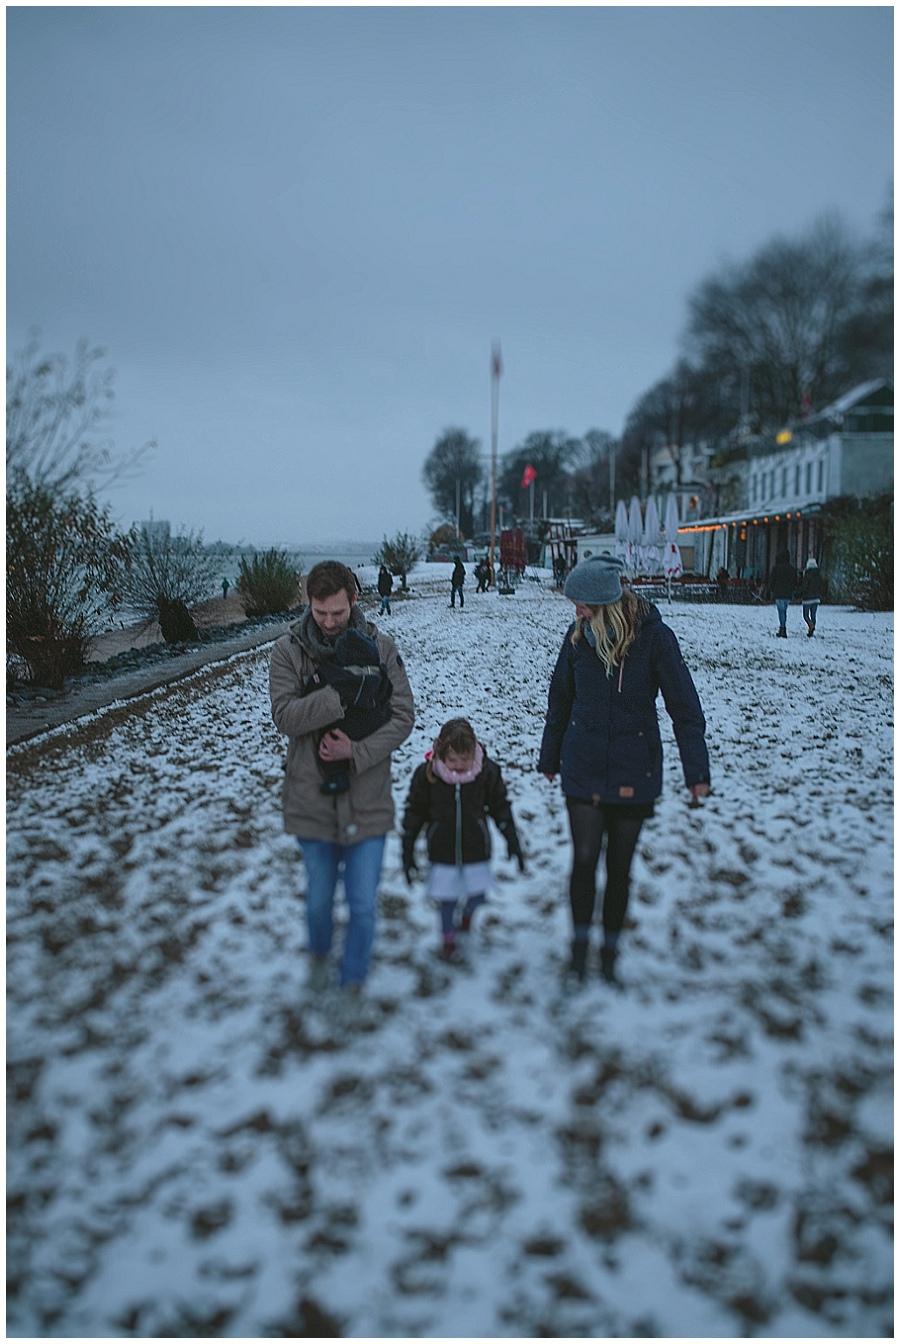 schneezauber-am-elbufer-familienfotografie-daniel-zube_0046.jpg